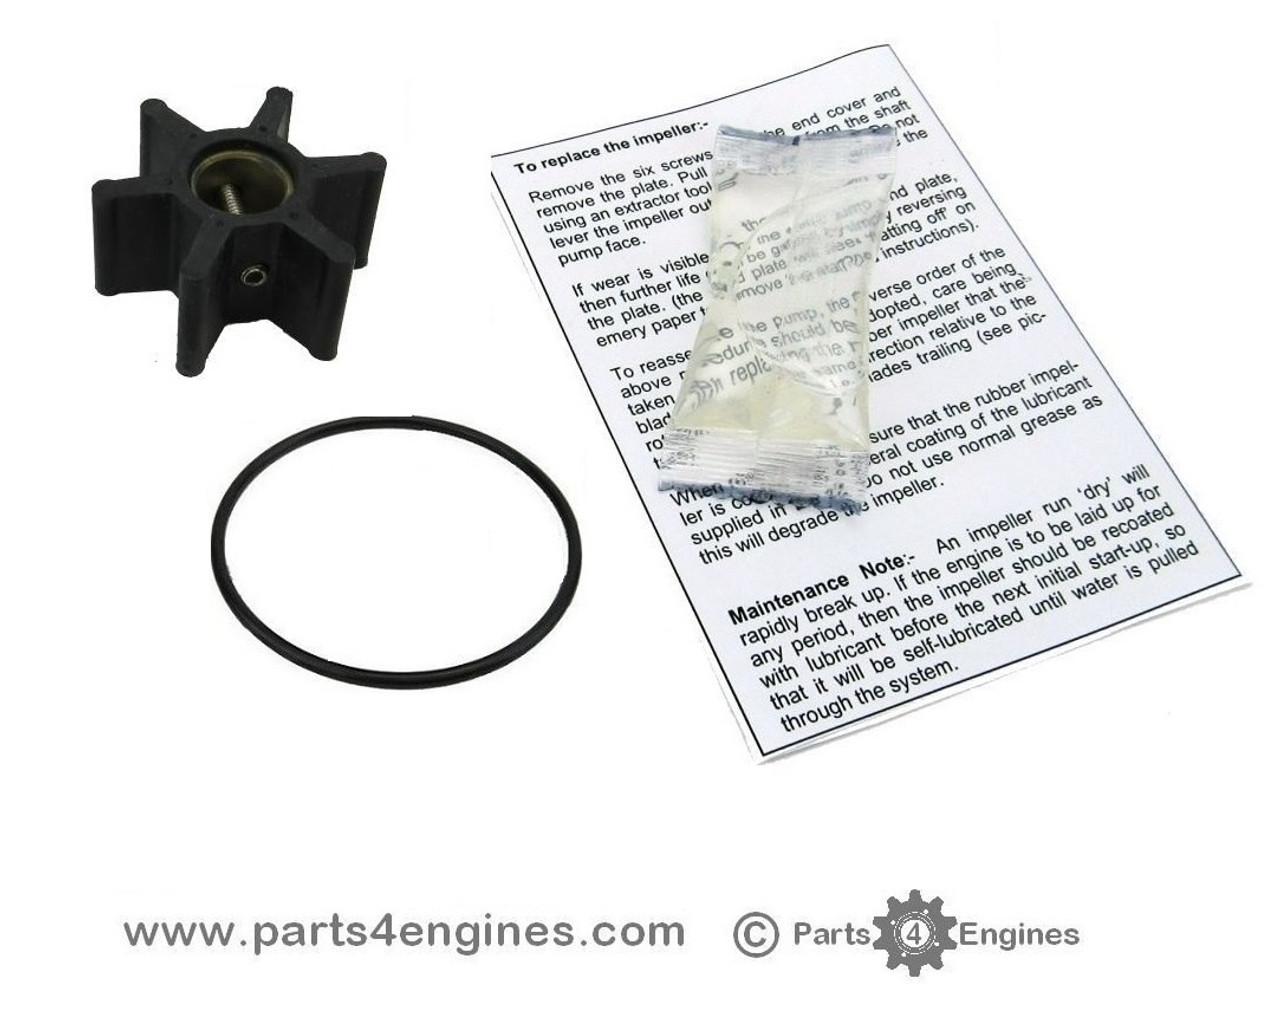 Yanmar 2YM15 Raw water pump impeller kit - parts4engines.com